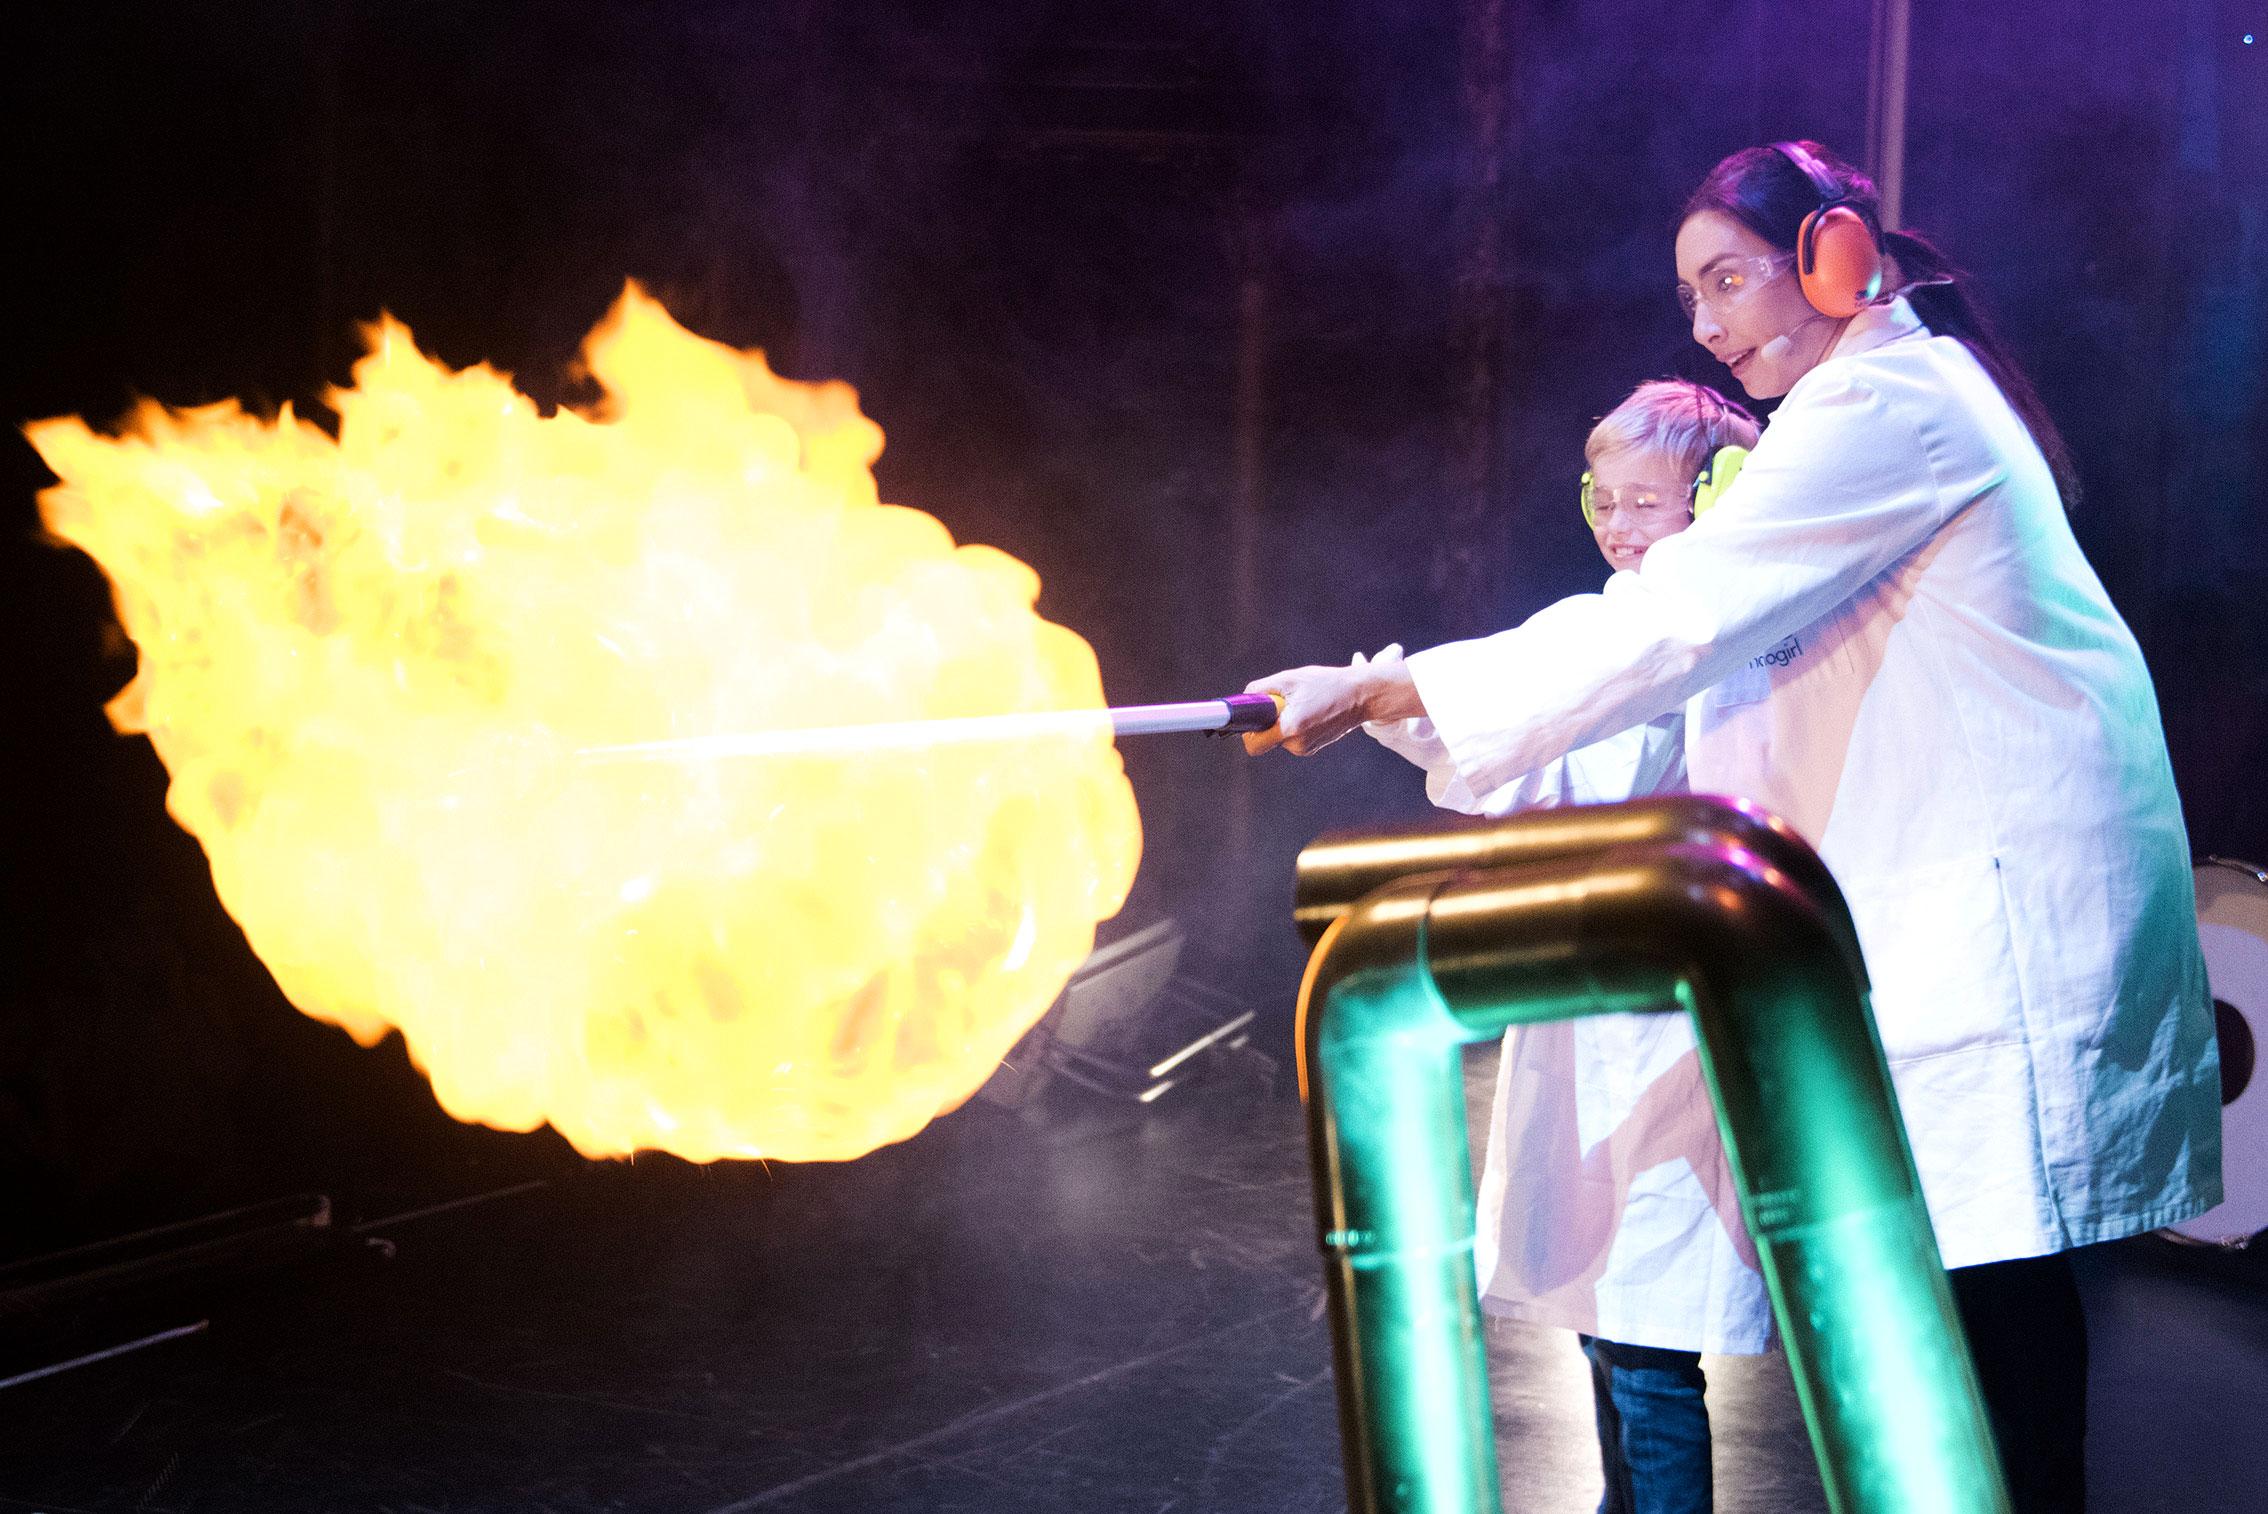 Nanogirl Live, Flour Fireball experiment